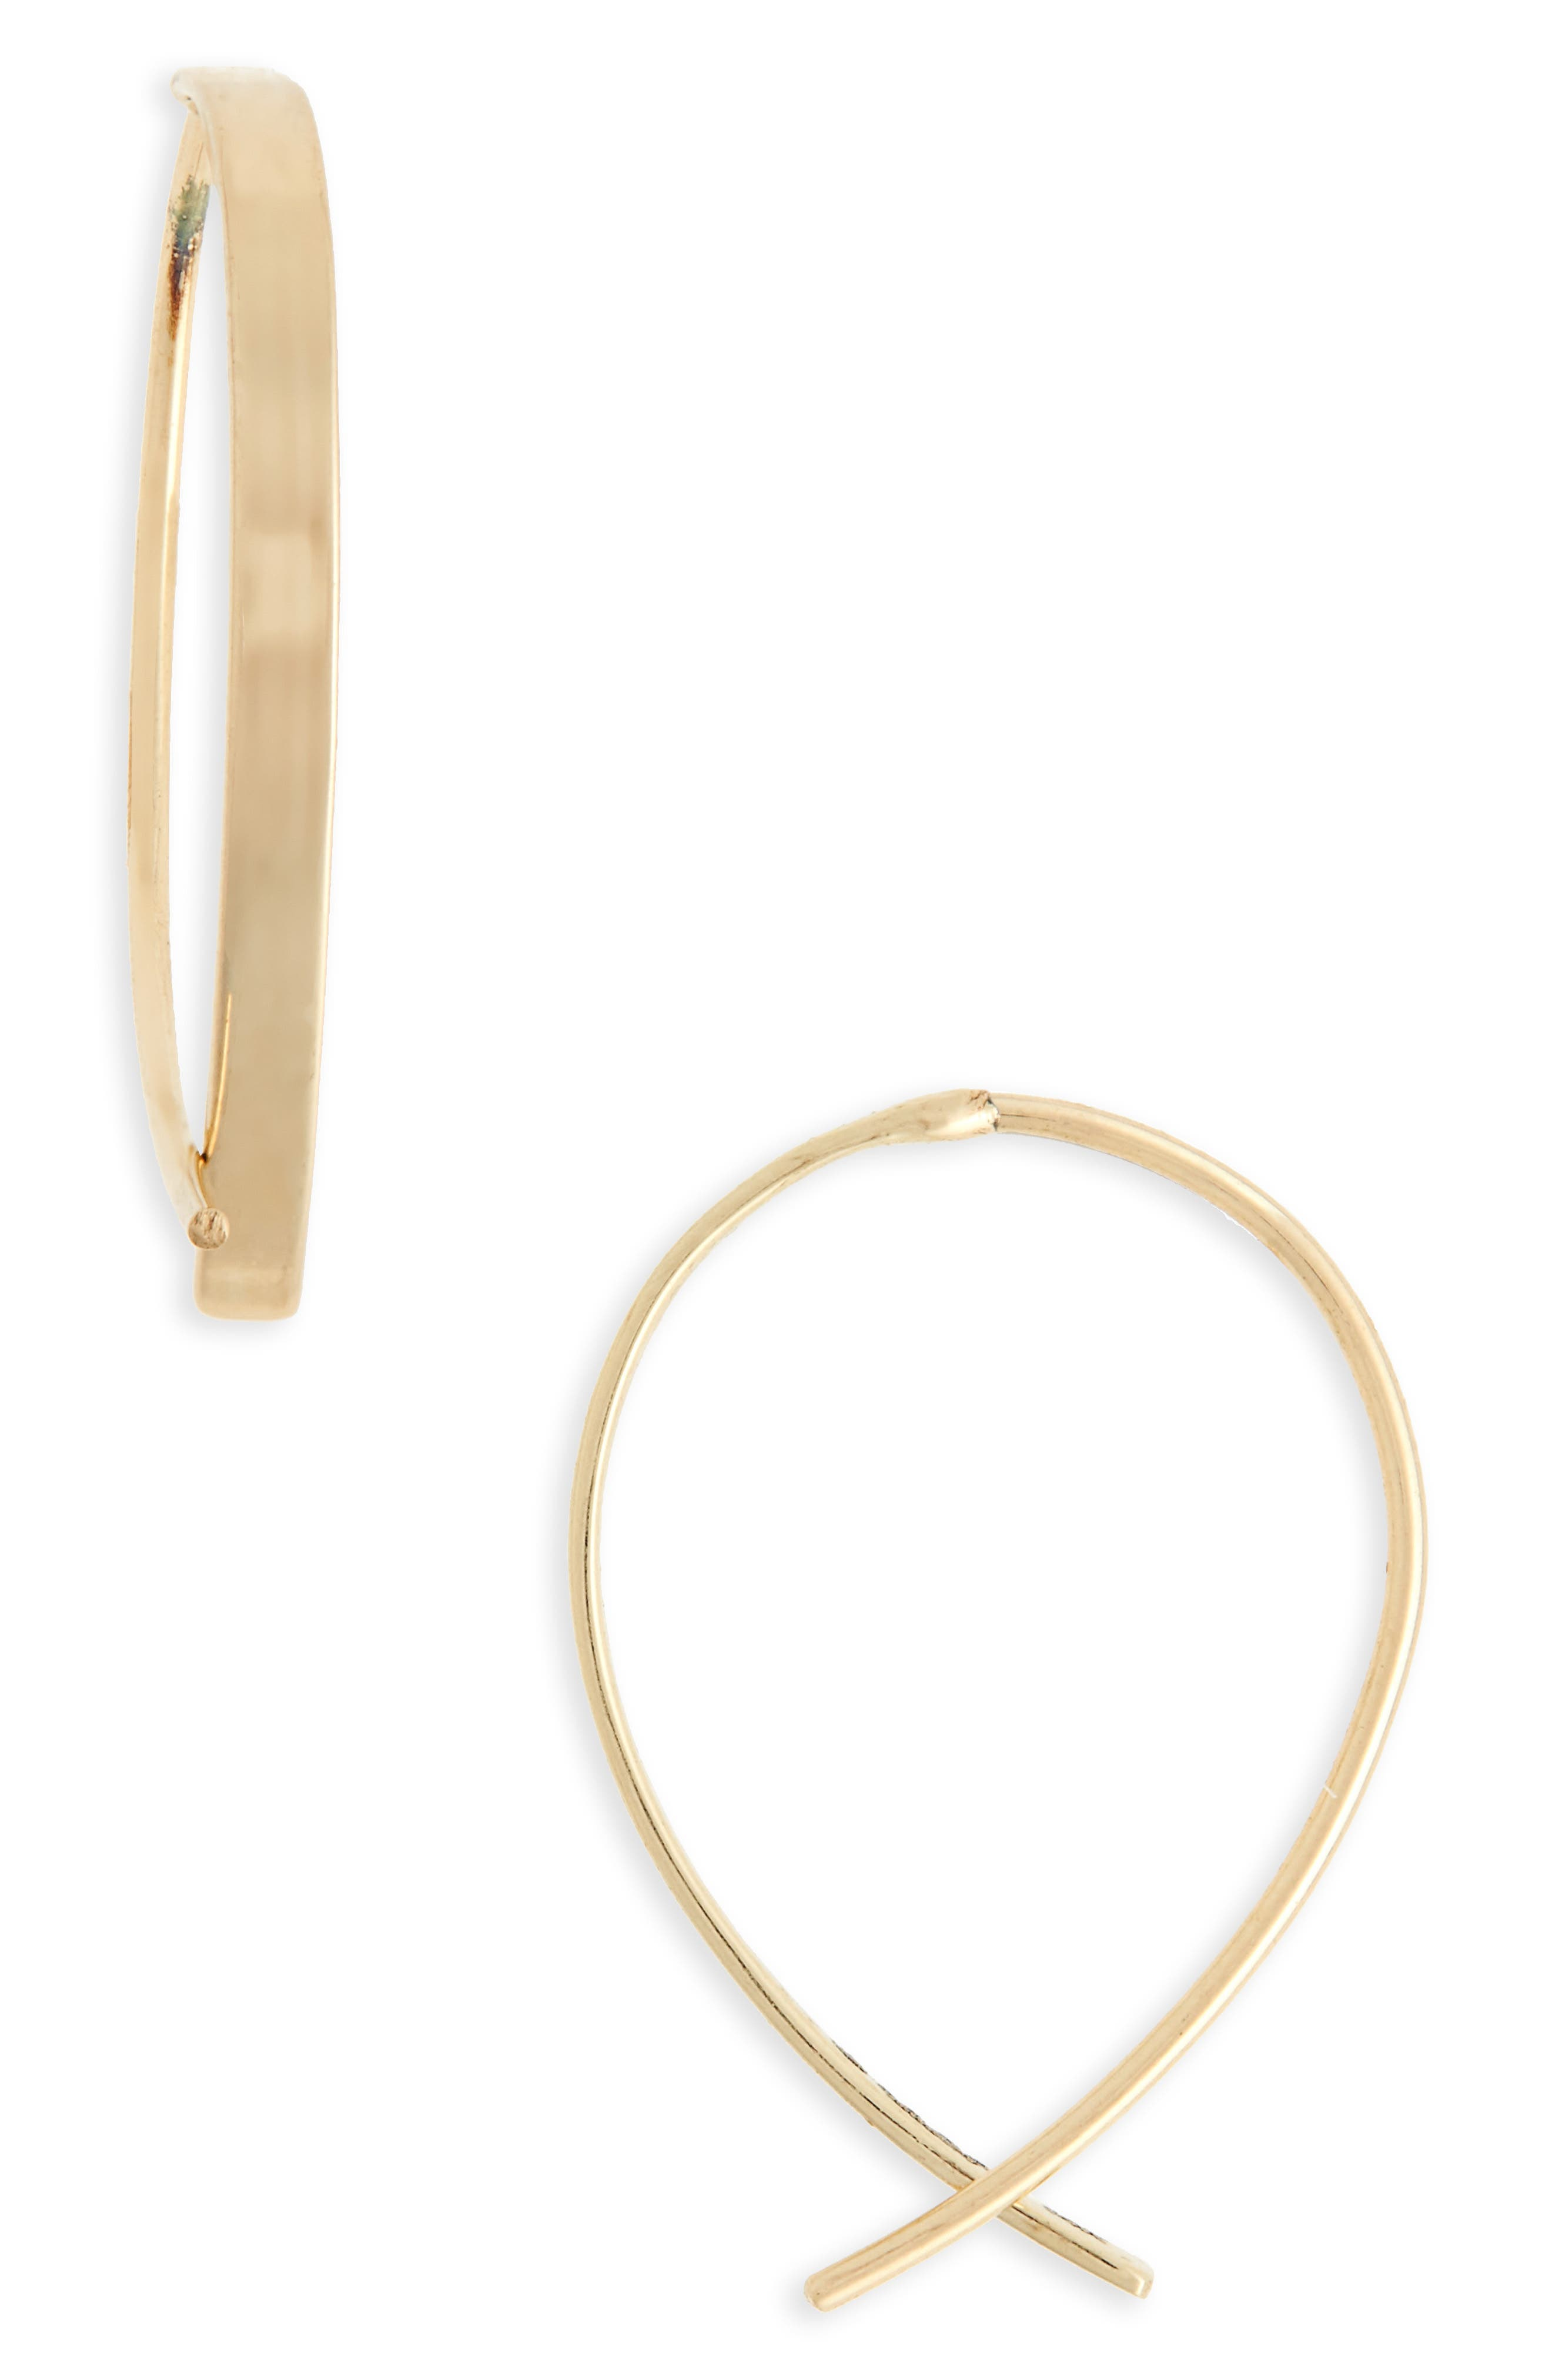 Alternate Image 1 Selected - Lana Girl by Lana Jewelry Upside Down Hoops (Girls)